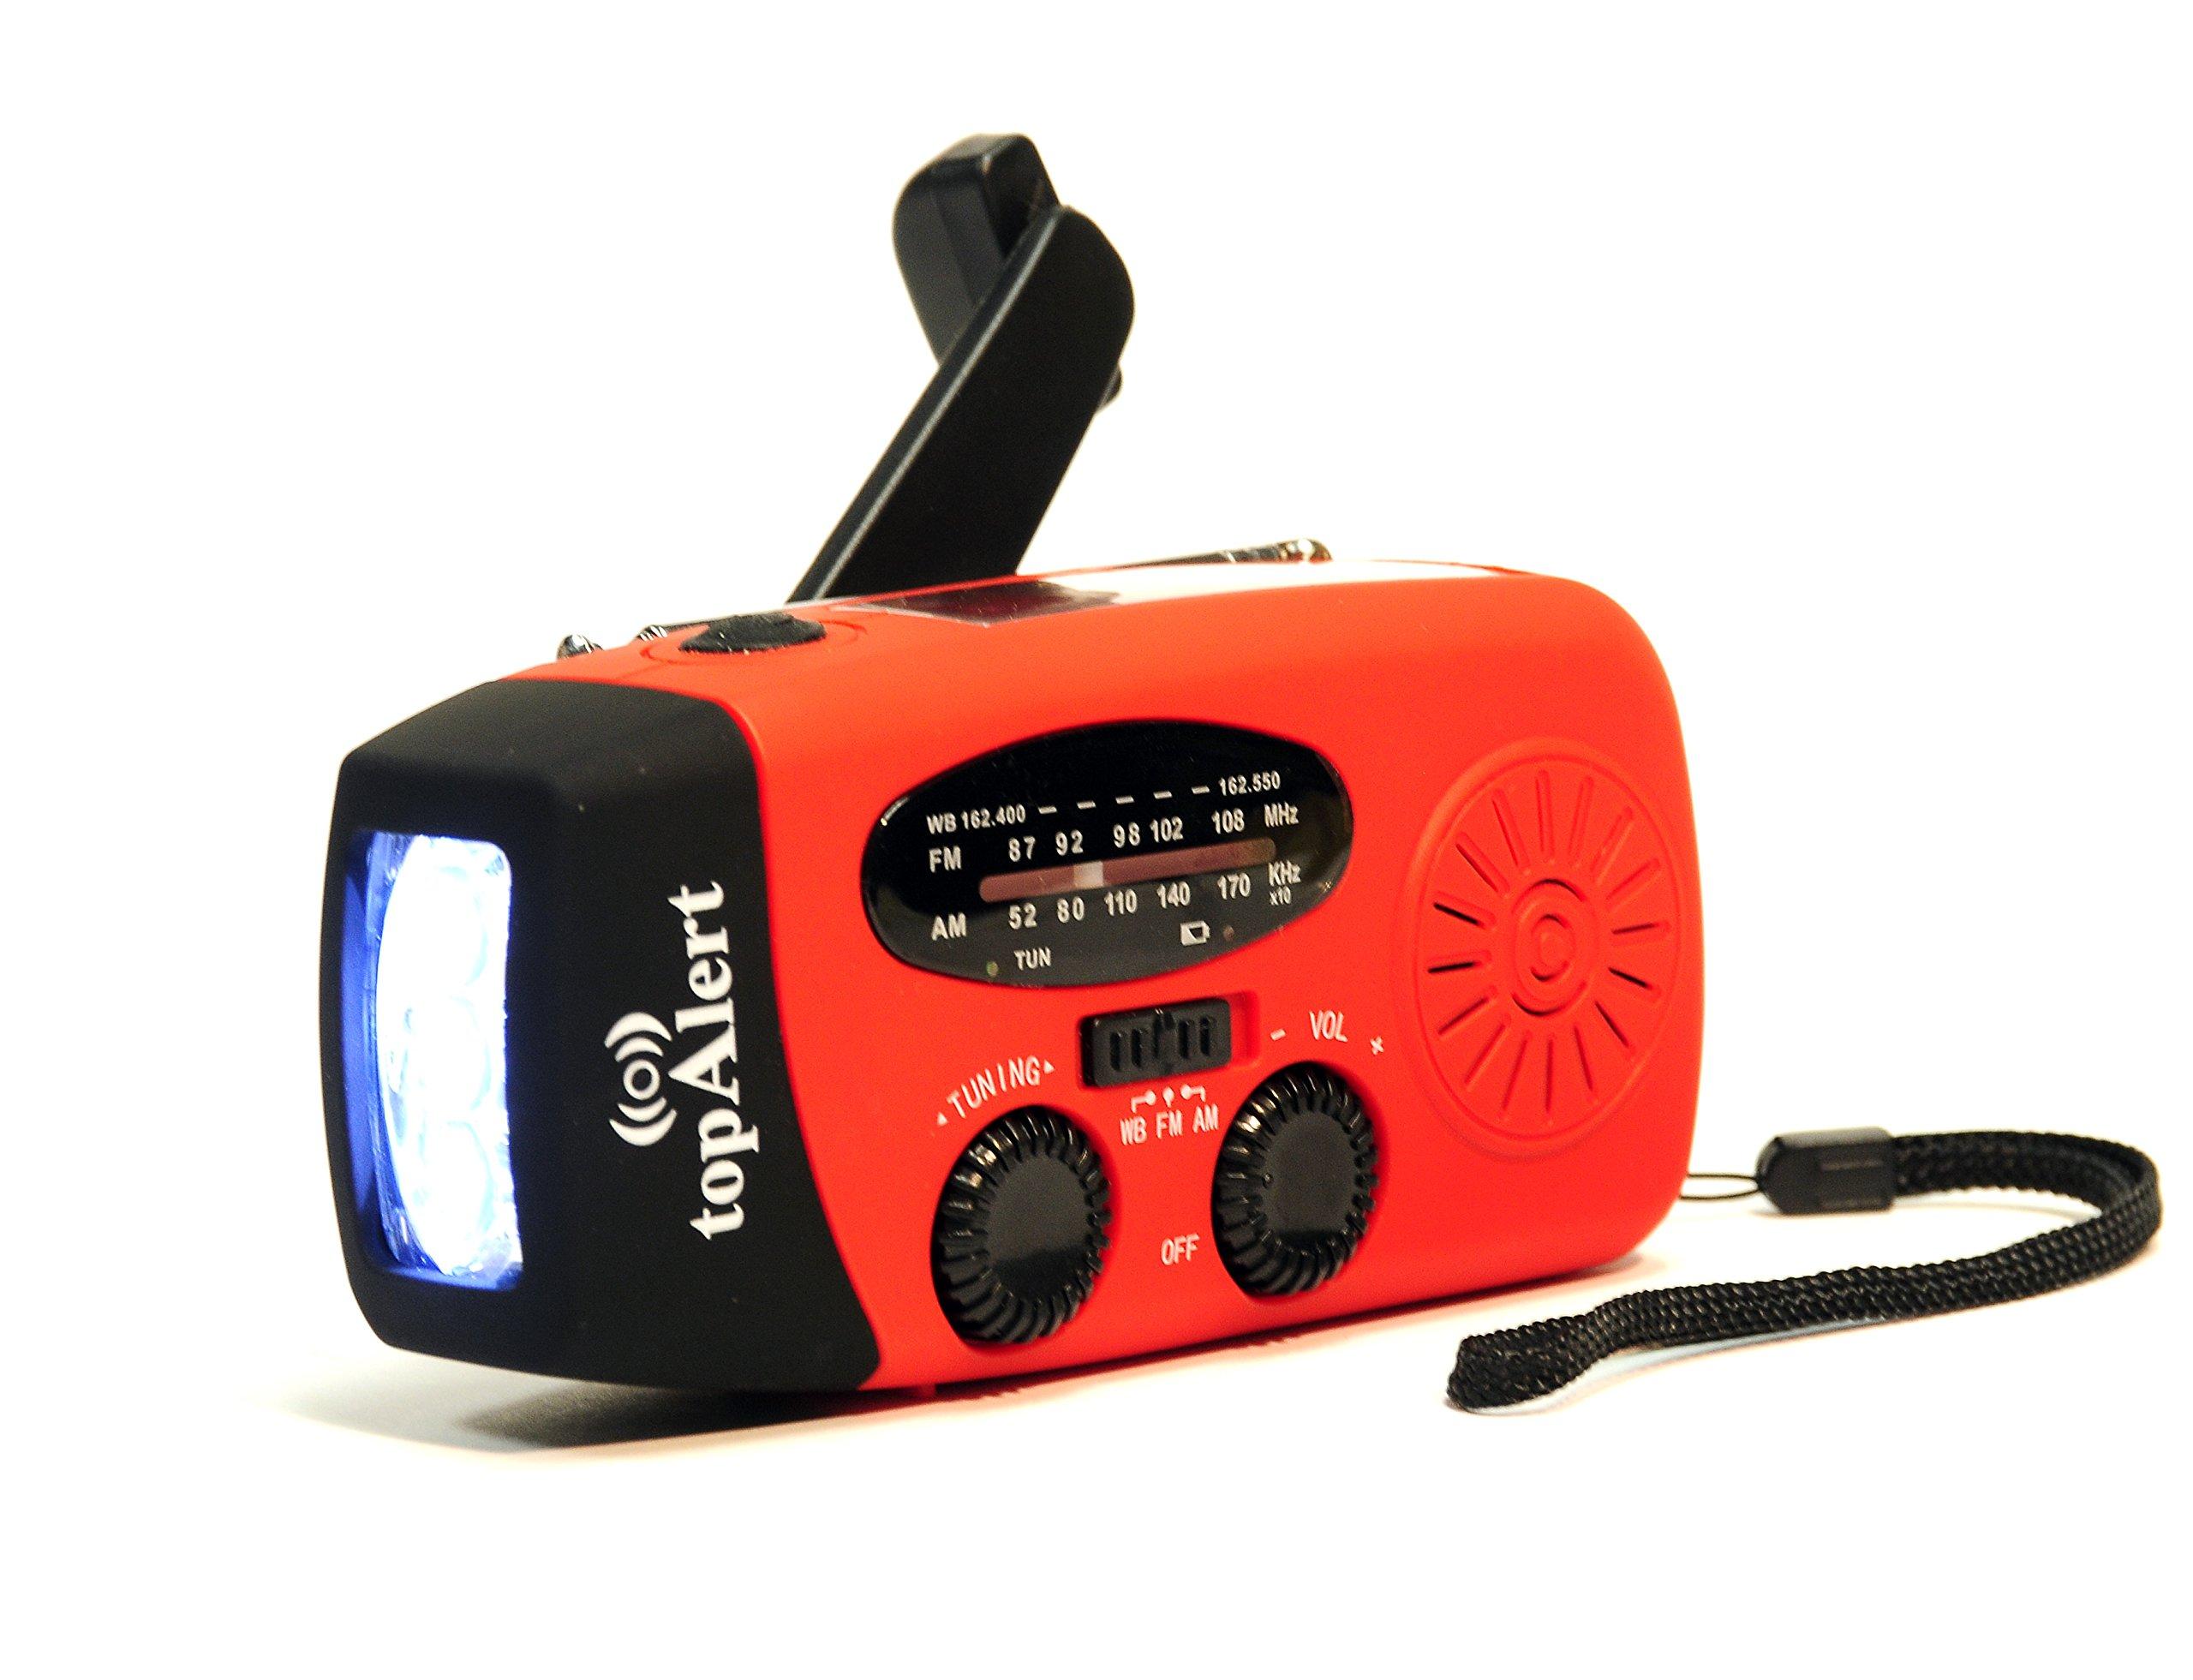 topAlert HY-88WB Emergency Dynamo Solar Self Powered AM/FM/WB(NOAA) Radio w/ LED Flashlight, Cell Phone Charger w/ USB adaptors and cords